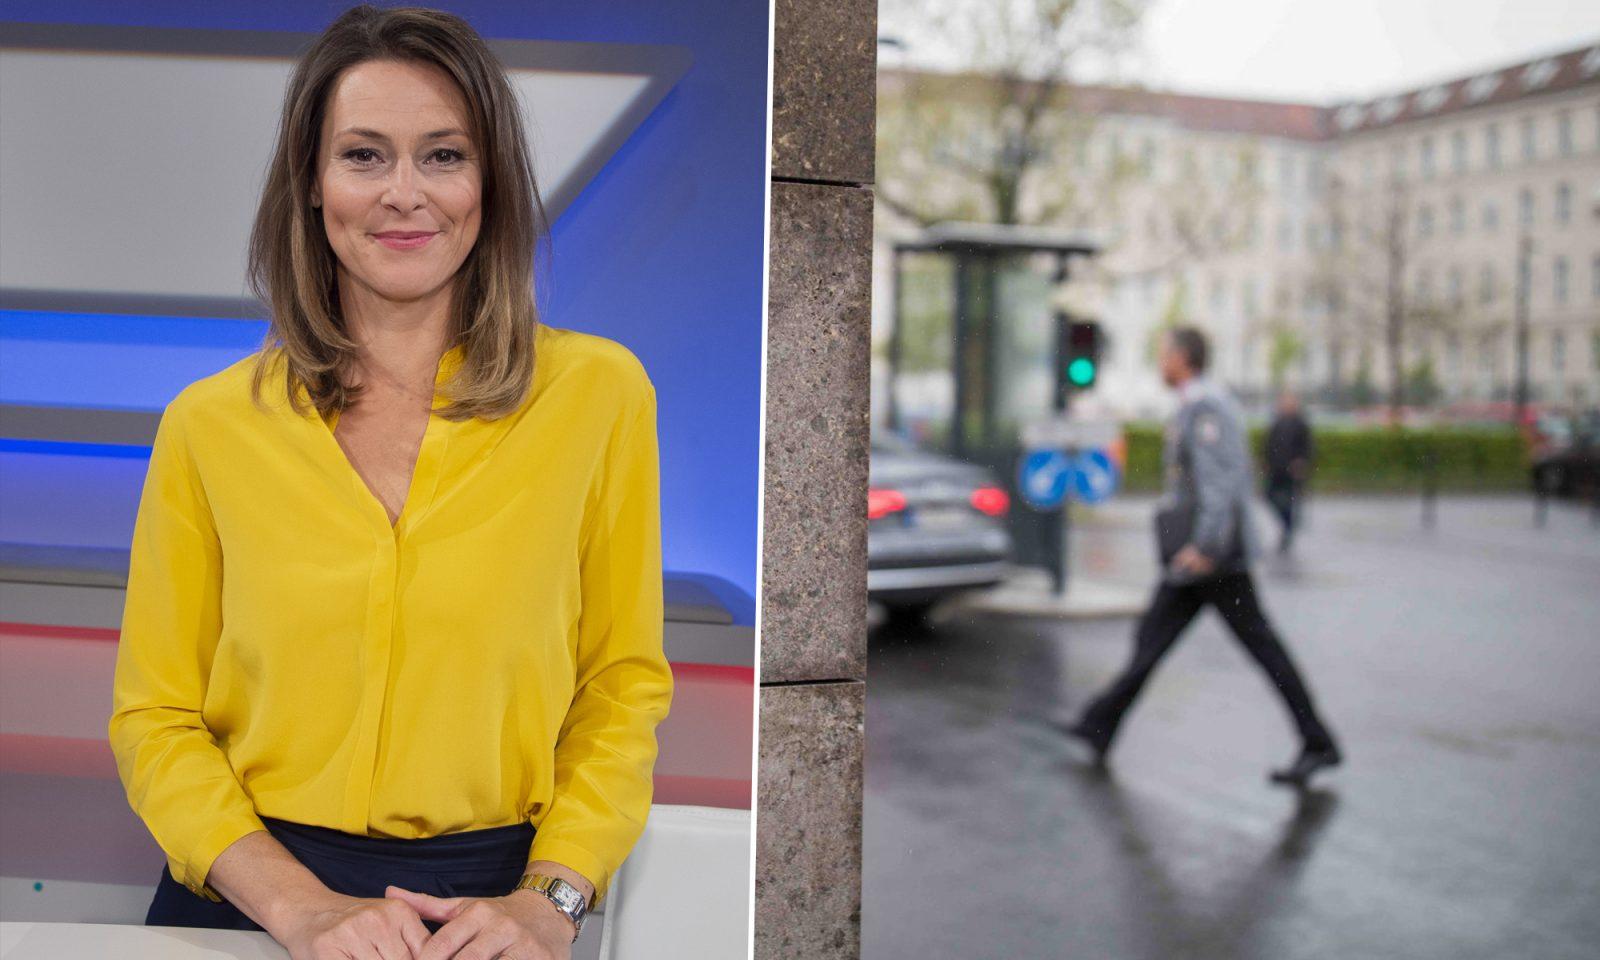 """Panorama""-Moderatorin Anja Reschke, Bundeswehr-Soldat Fotos: picture alliance/dpa / Sven Simon / JF-Montage"